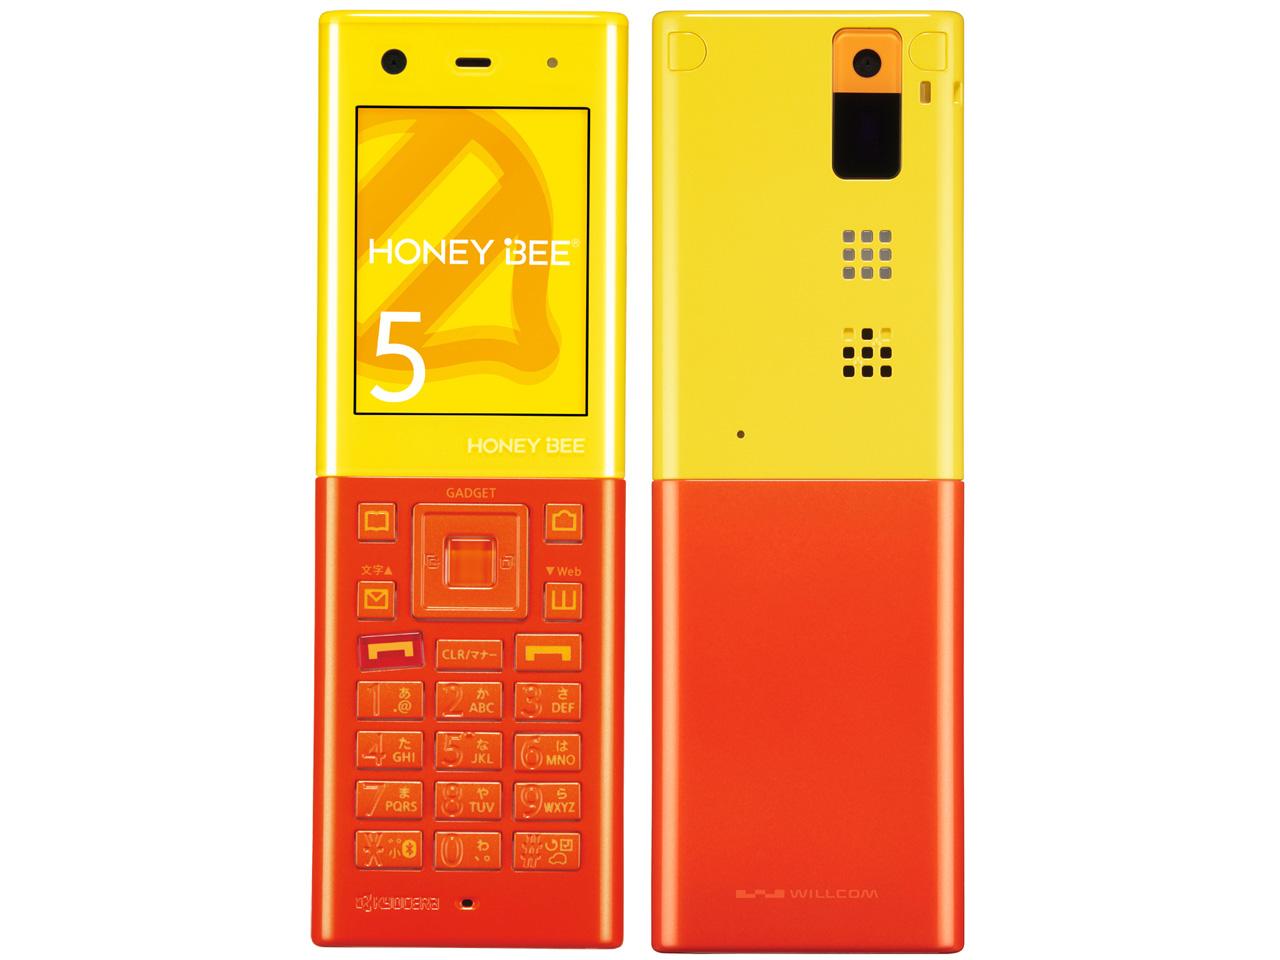 HONEY BEE 5 WX07K [イエロー&オレンジ] の製品画像